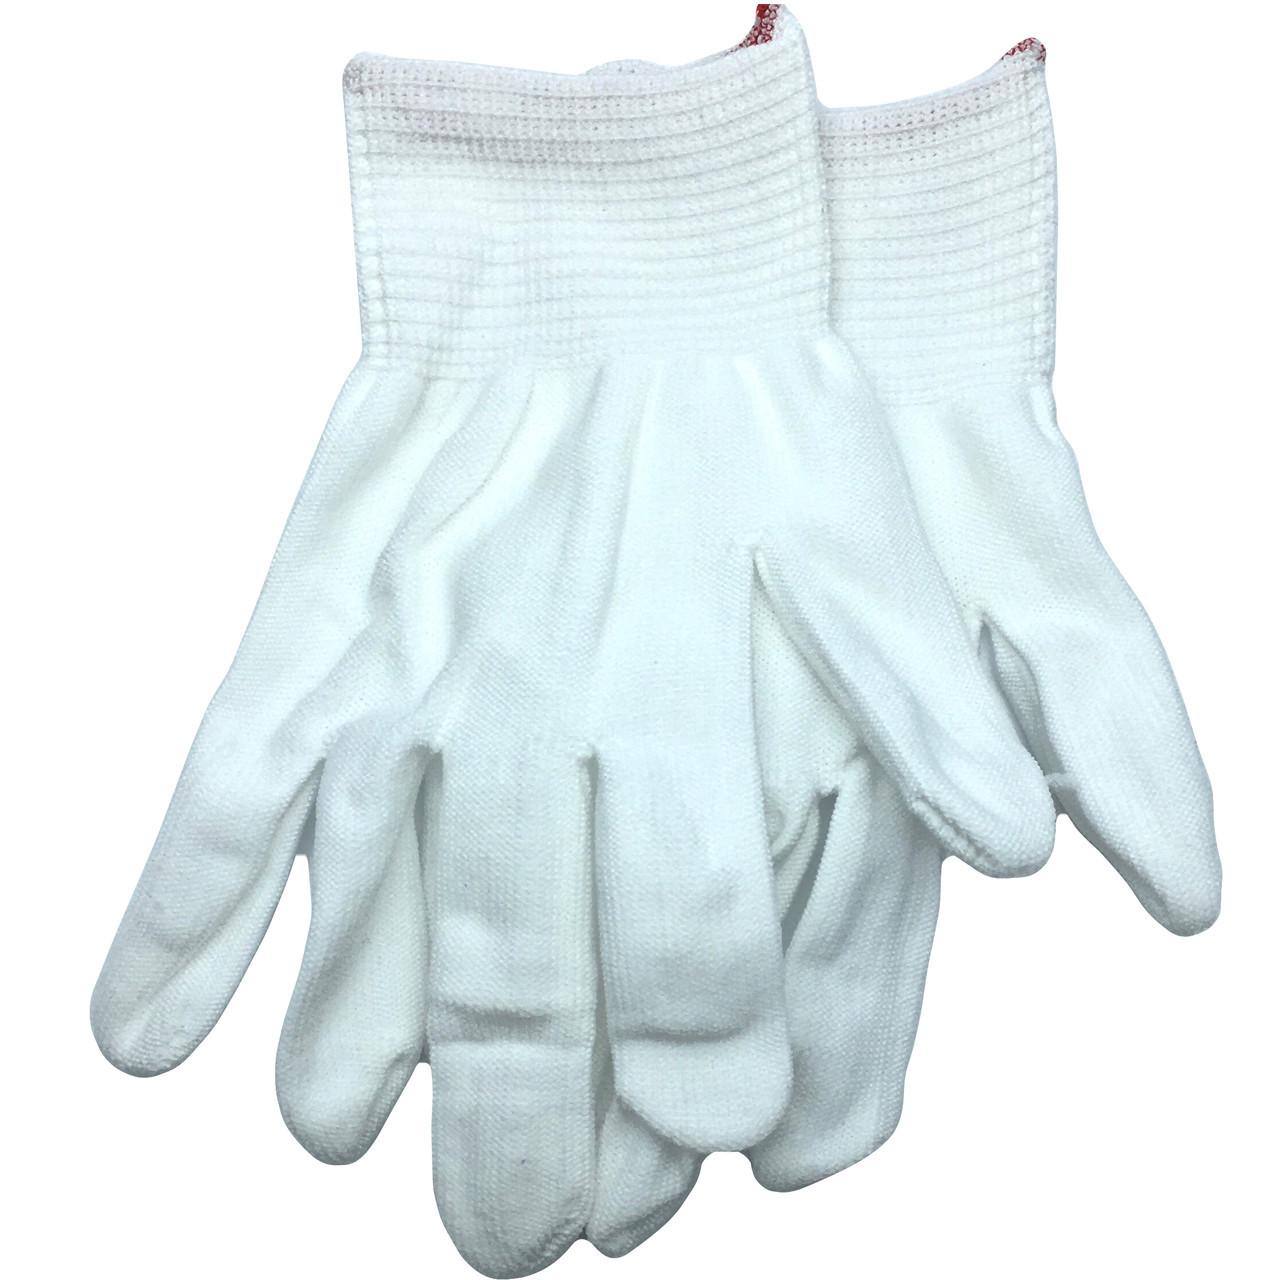 Перчатки Fabric ремонта электротехники (white)